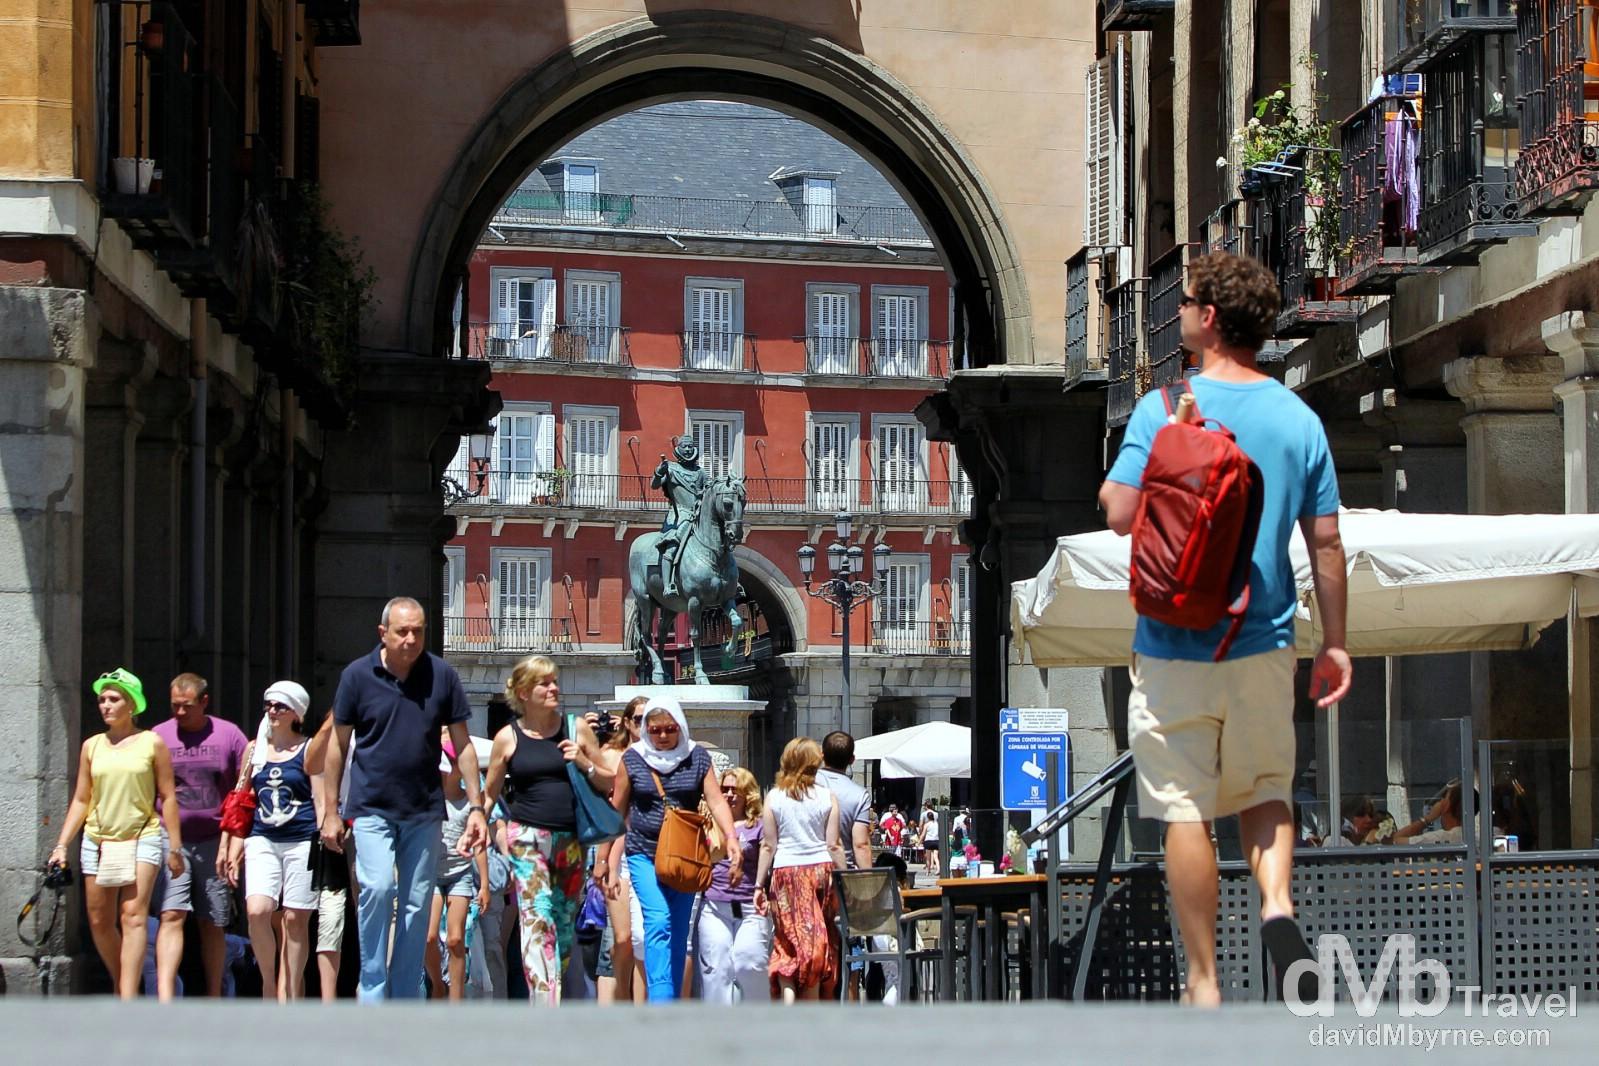 Looking towards Plaza Mayor from Plaza de Santa Cruz in Madrid, Spain. June 14th, 2014.